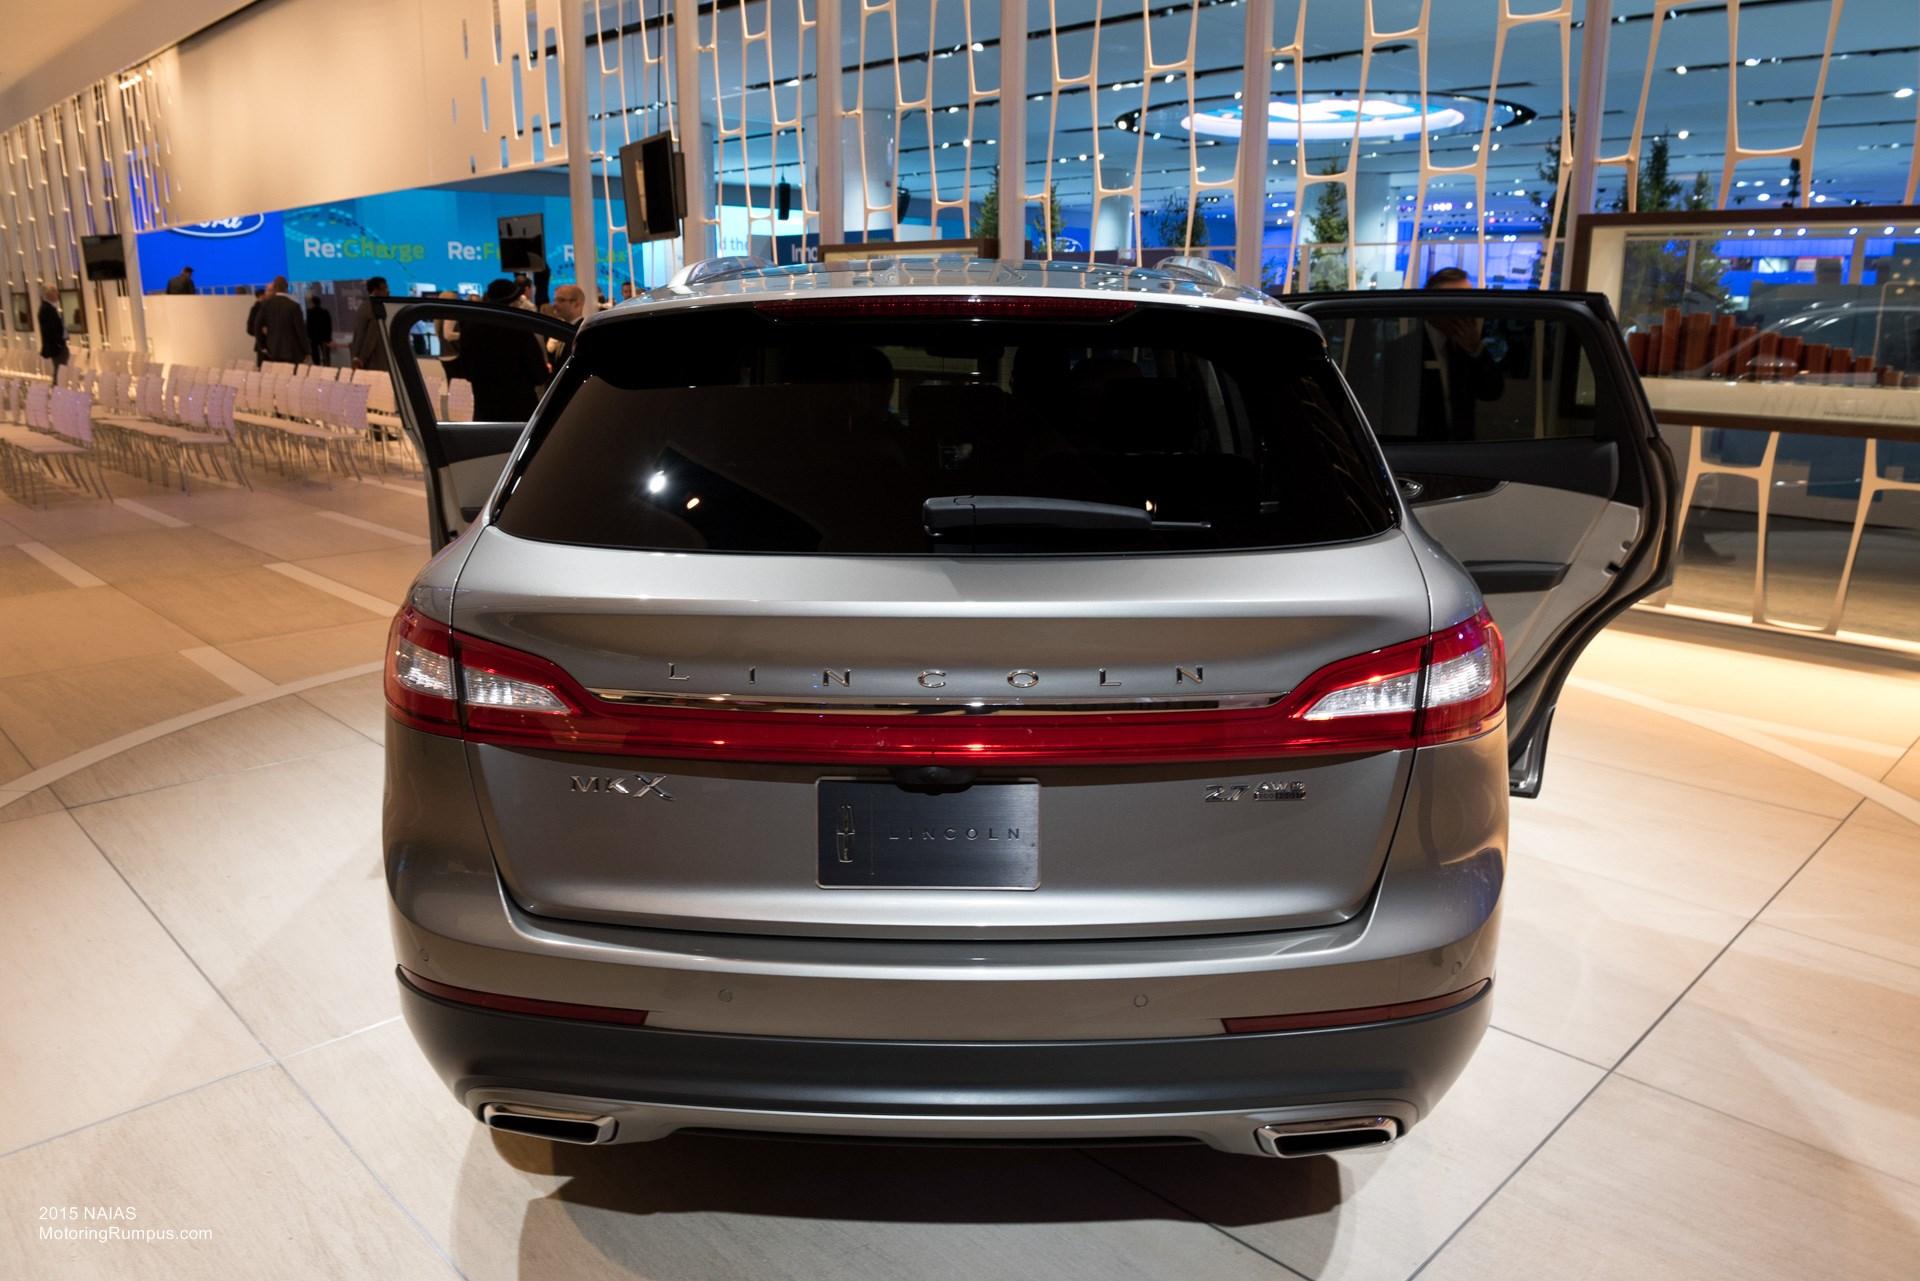 2015 NAIAS - 2016 Lincoln MKX Rear